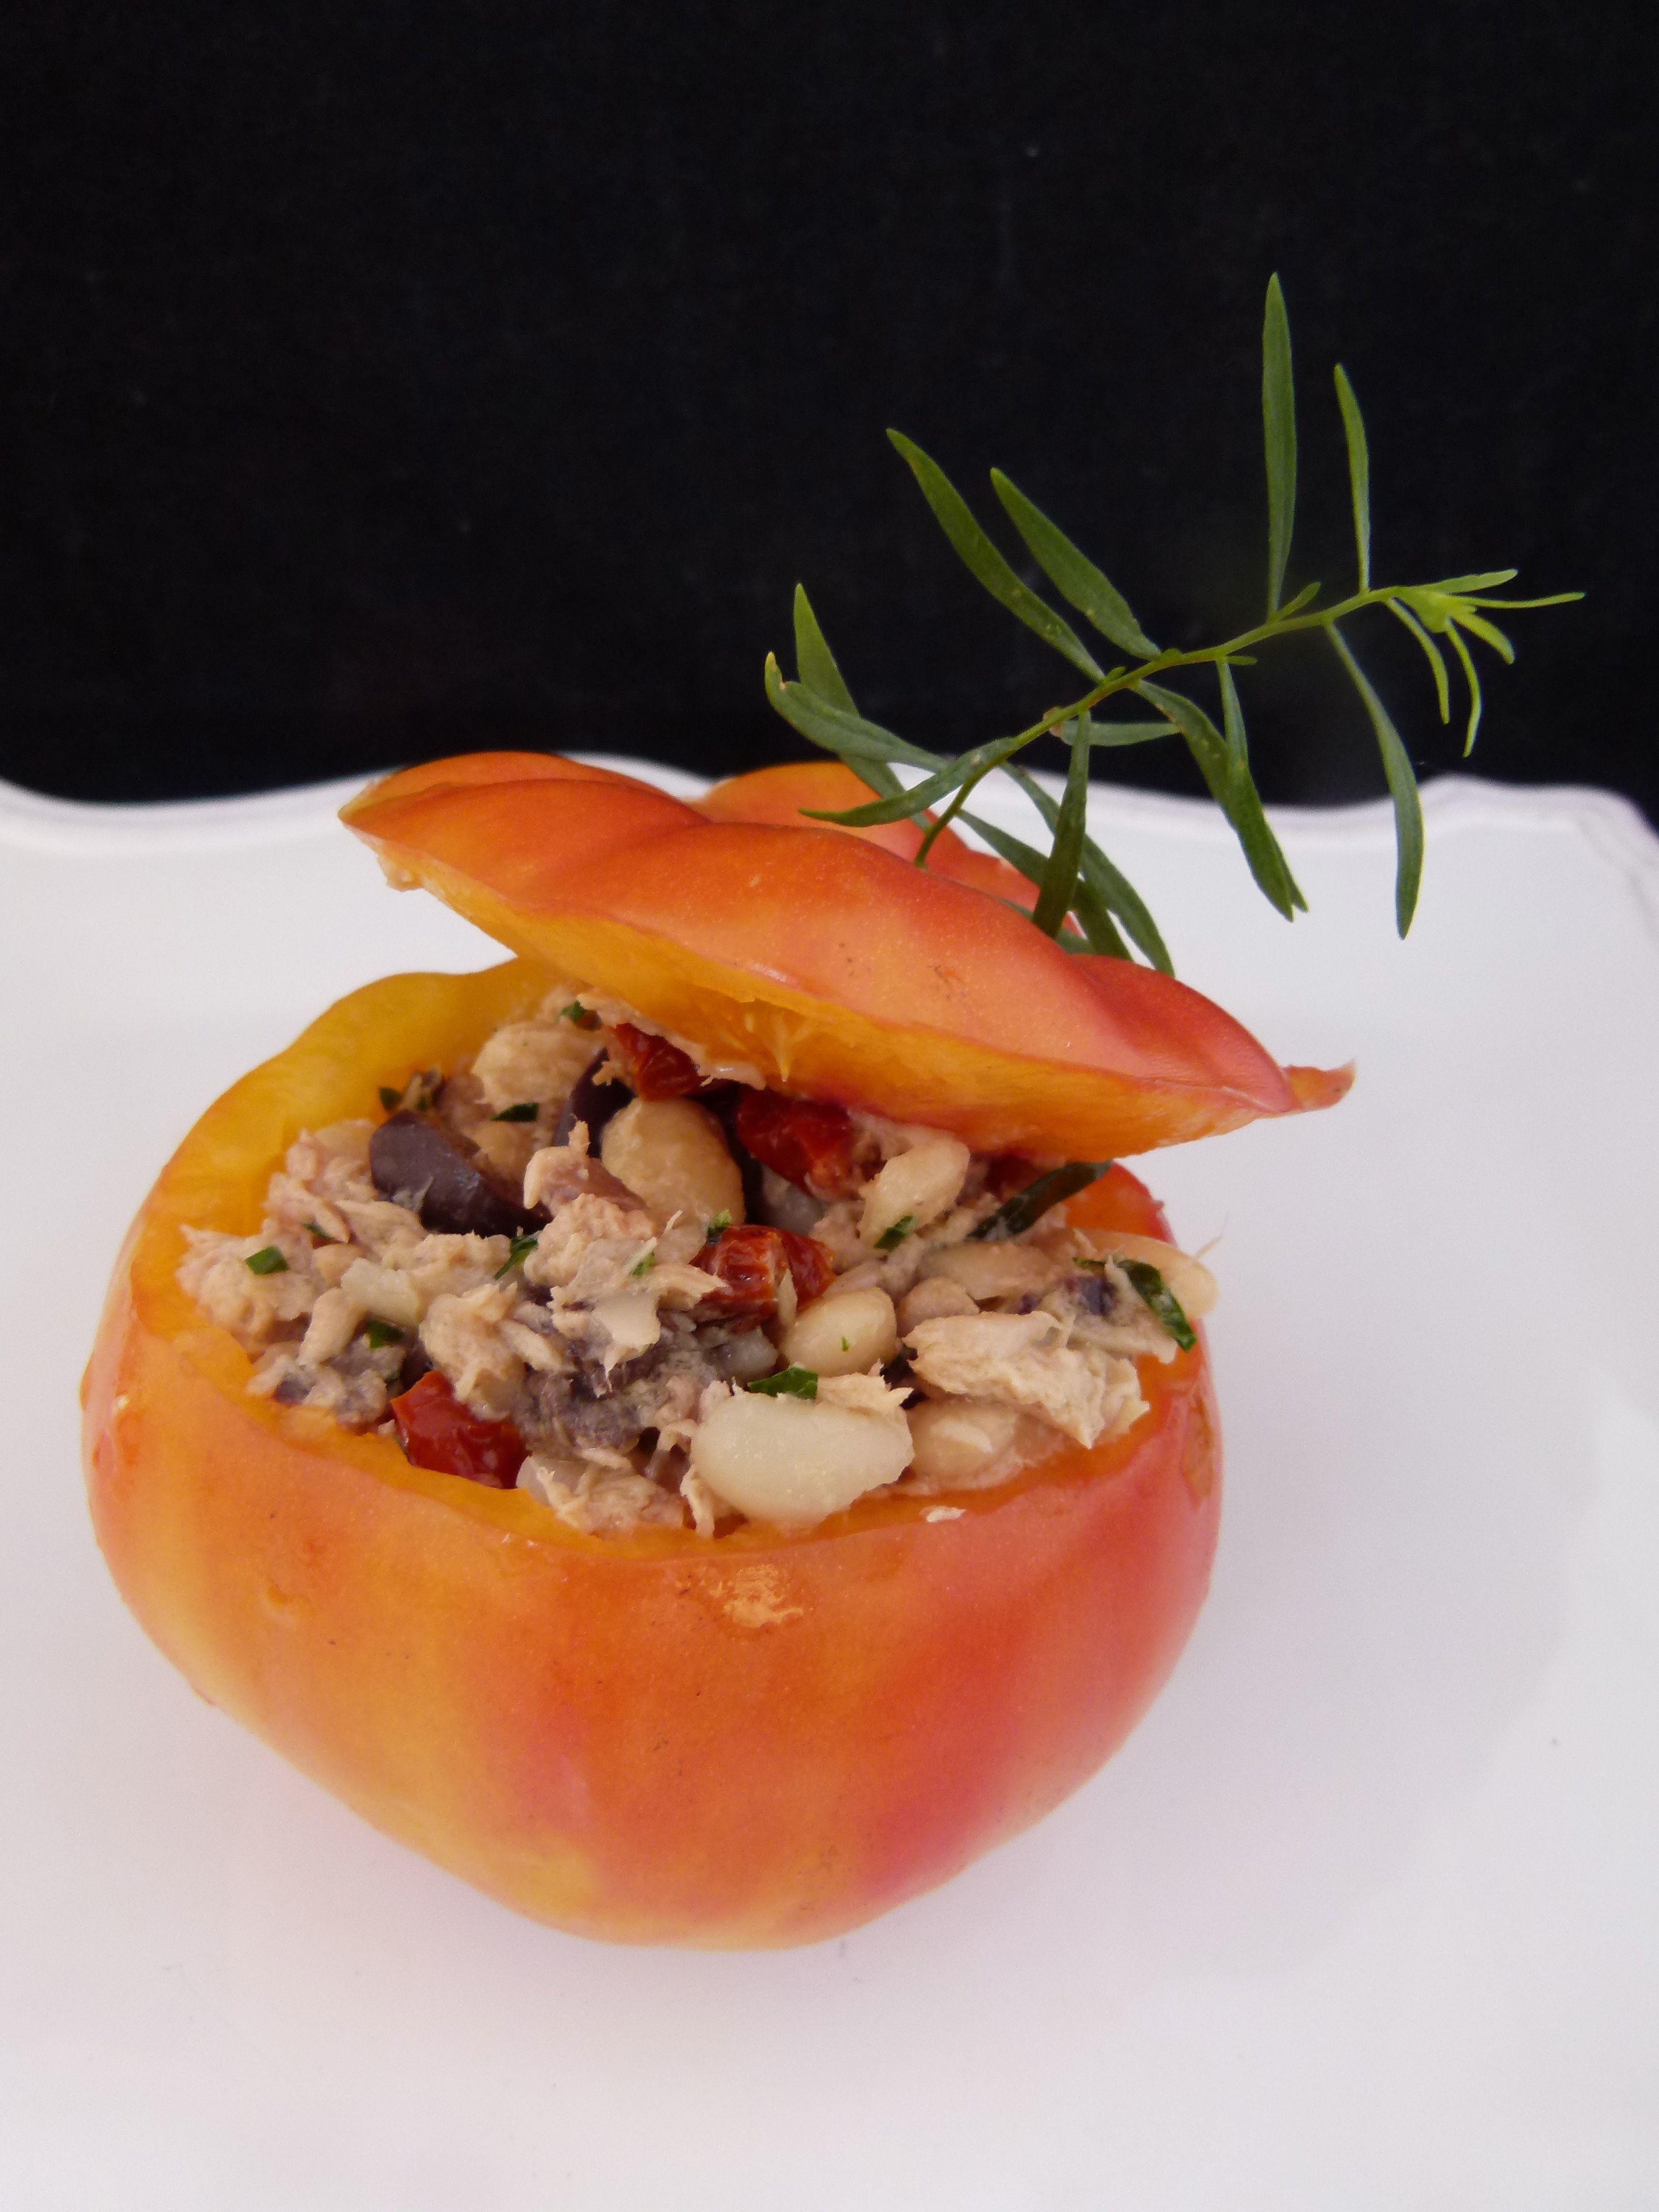 fresh stuffed heirloom tomato with tuna, Cannellini beans and tarragon